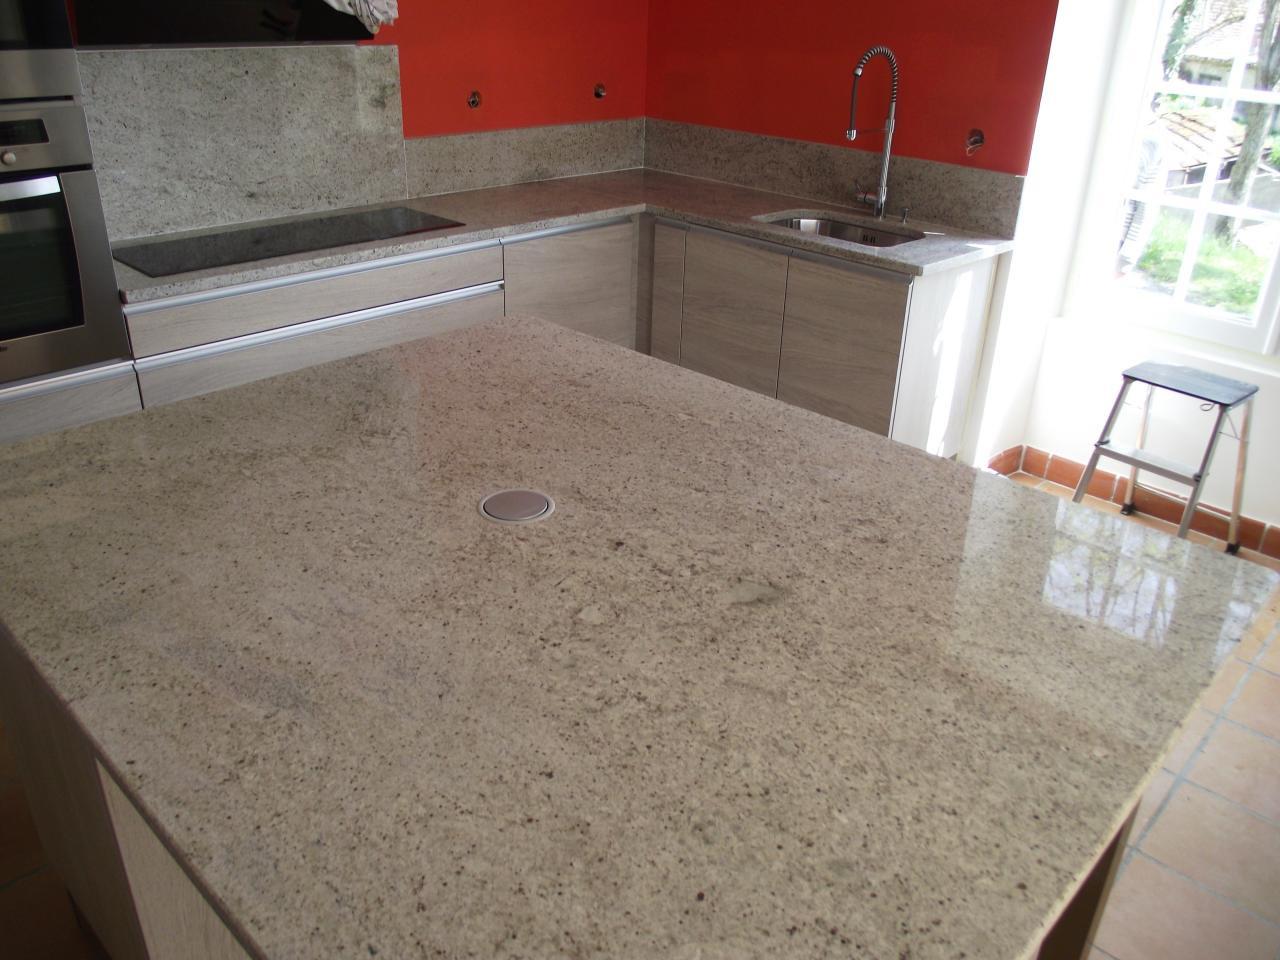 Acheter plan de travail granit portugal - pearlfection.fr